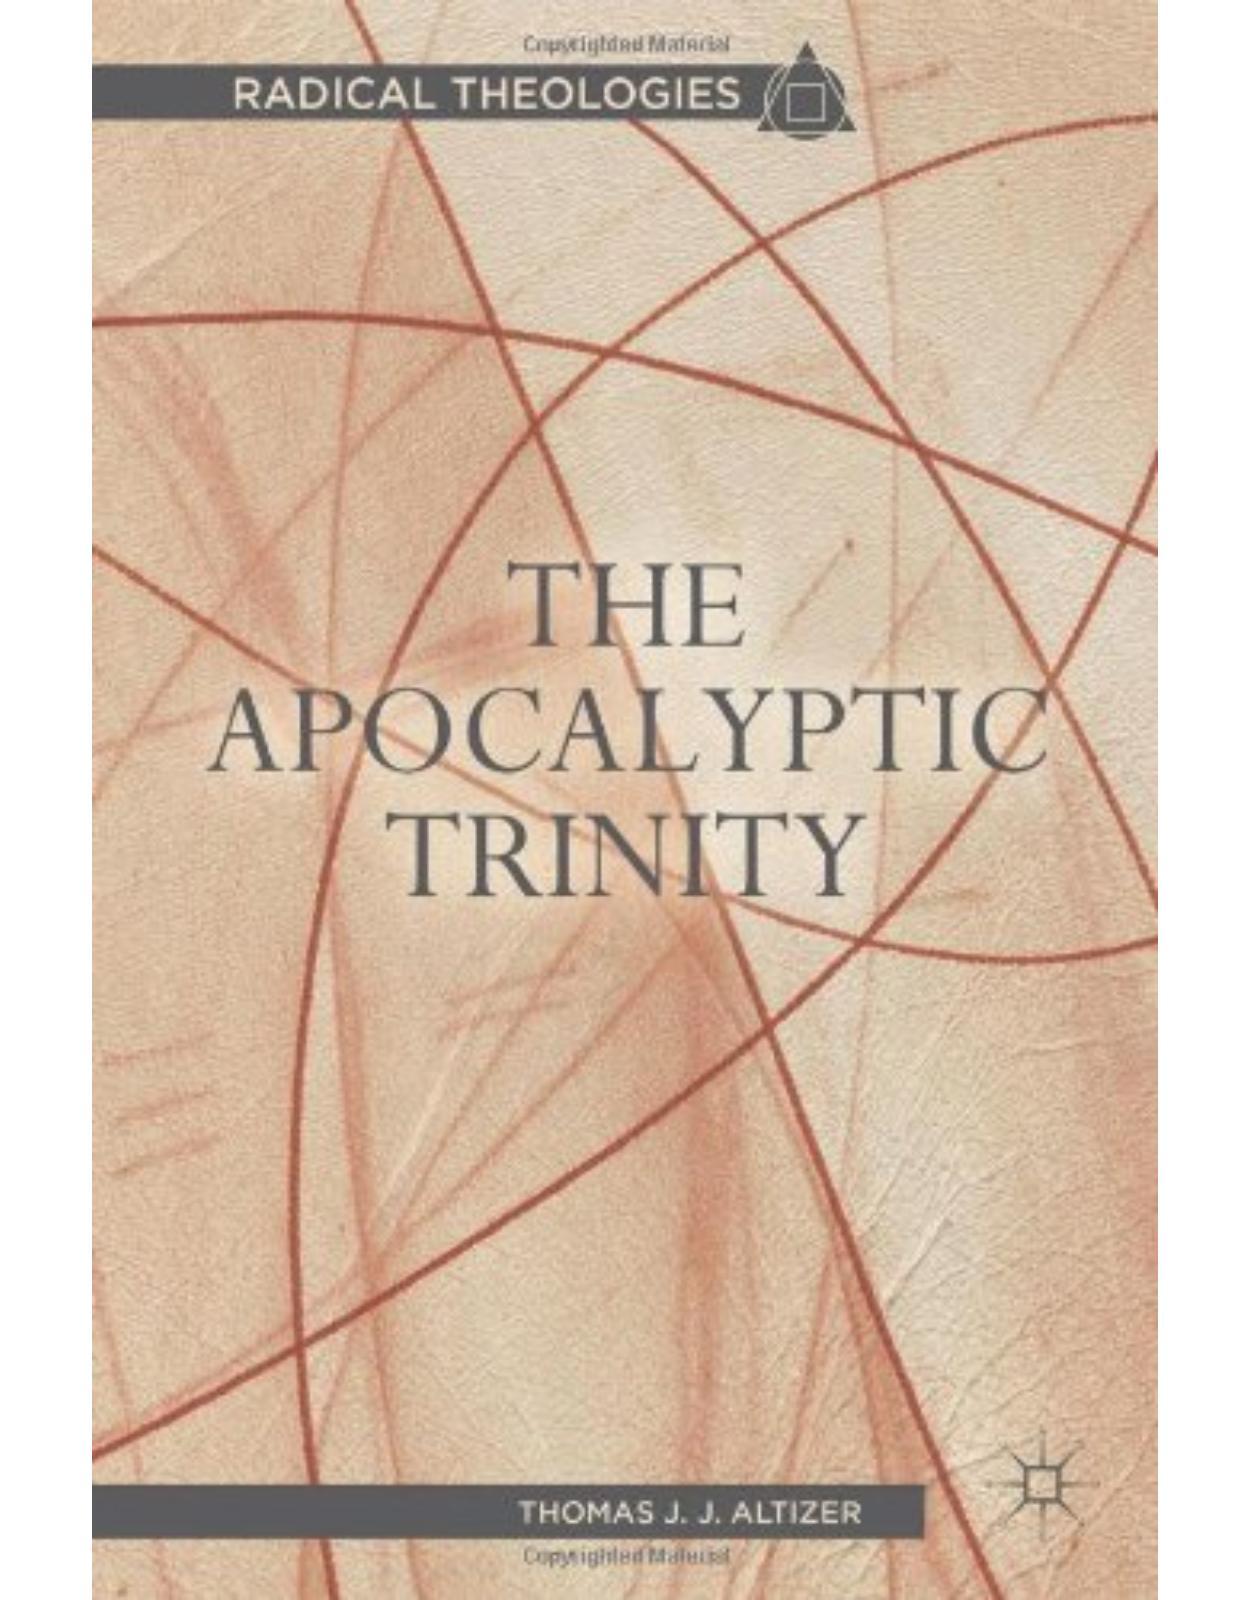 The Apocalyptic Trinity (Radical Theologies)